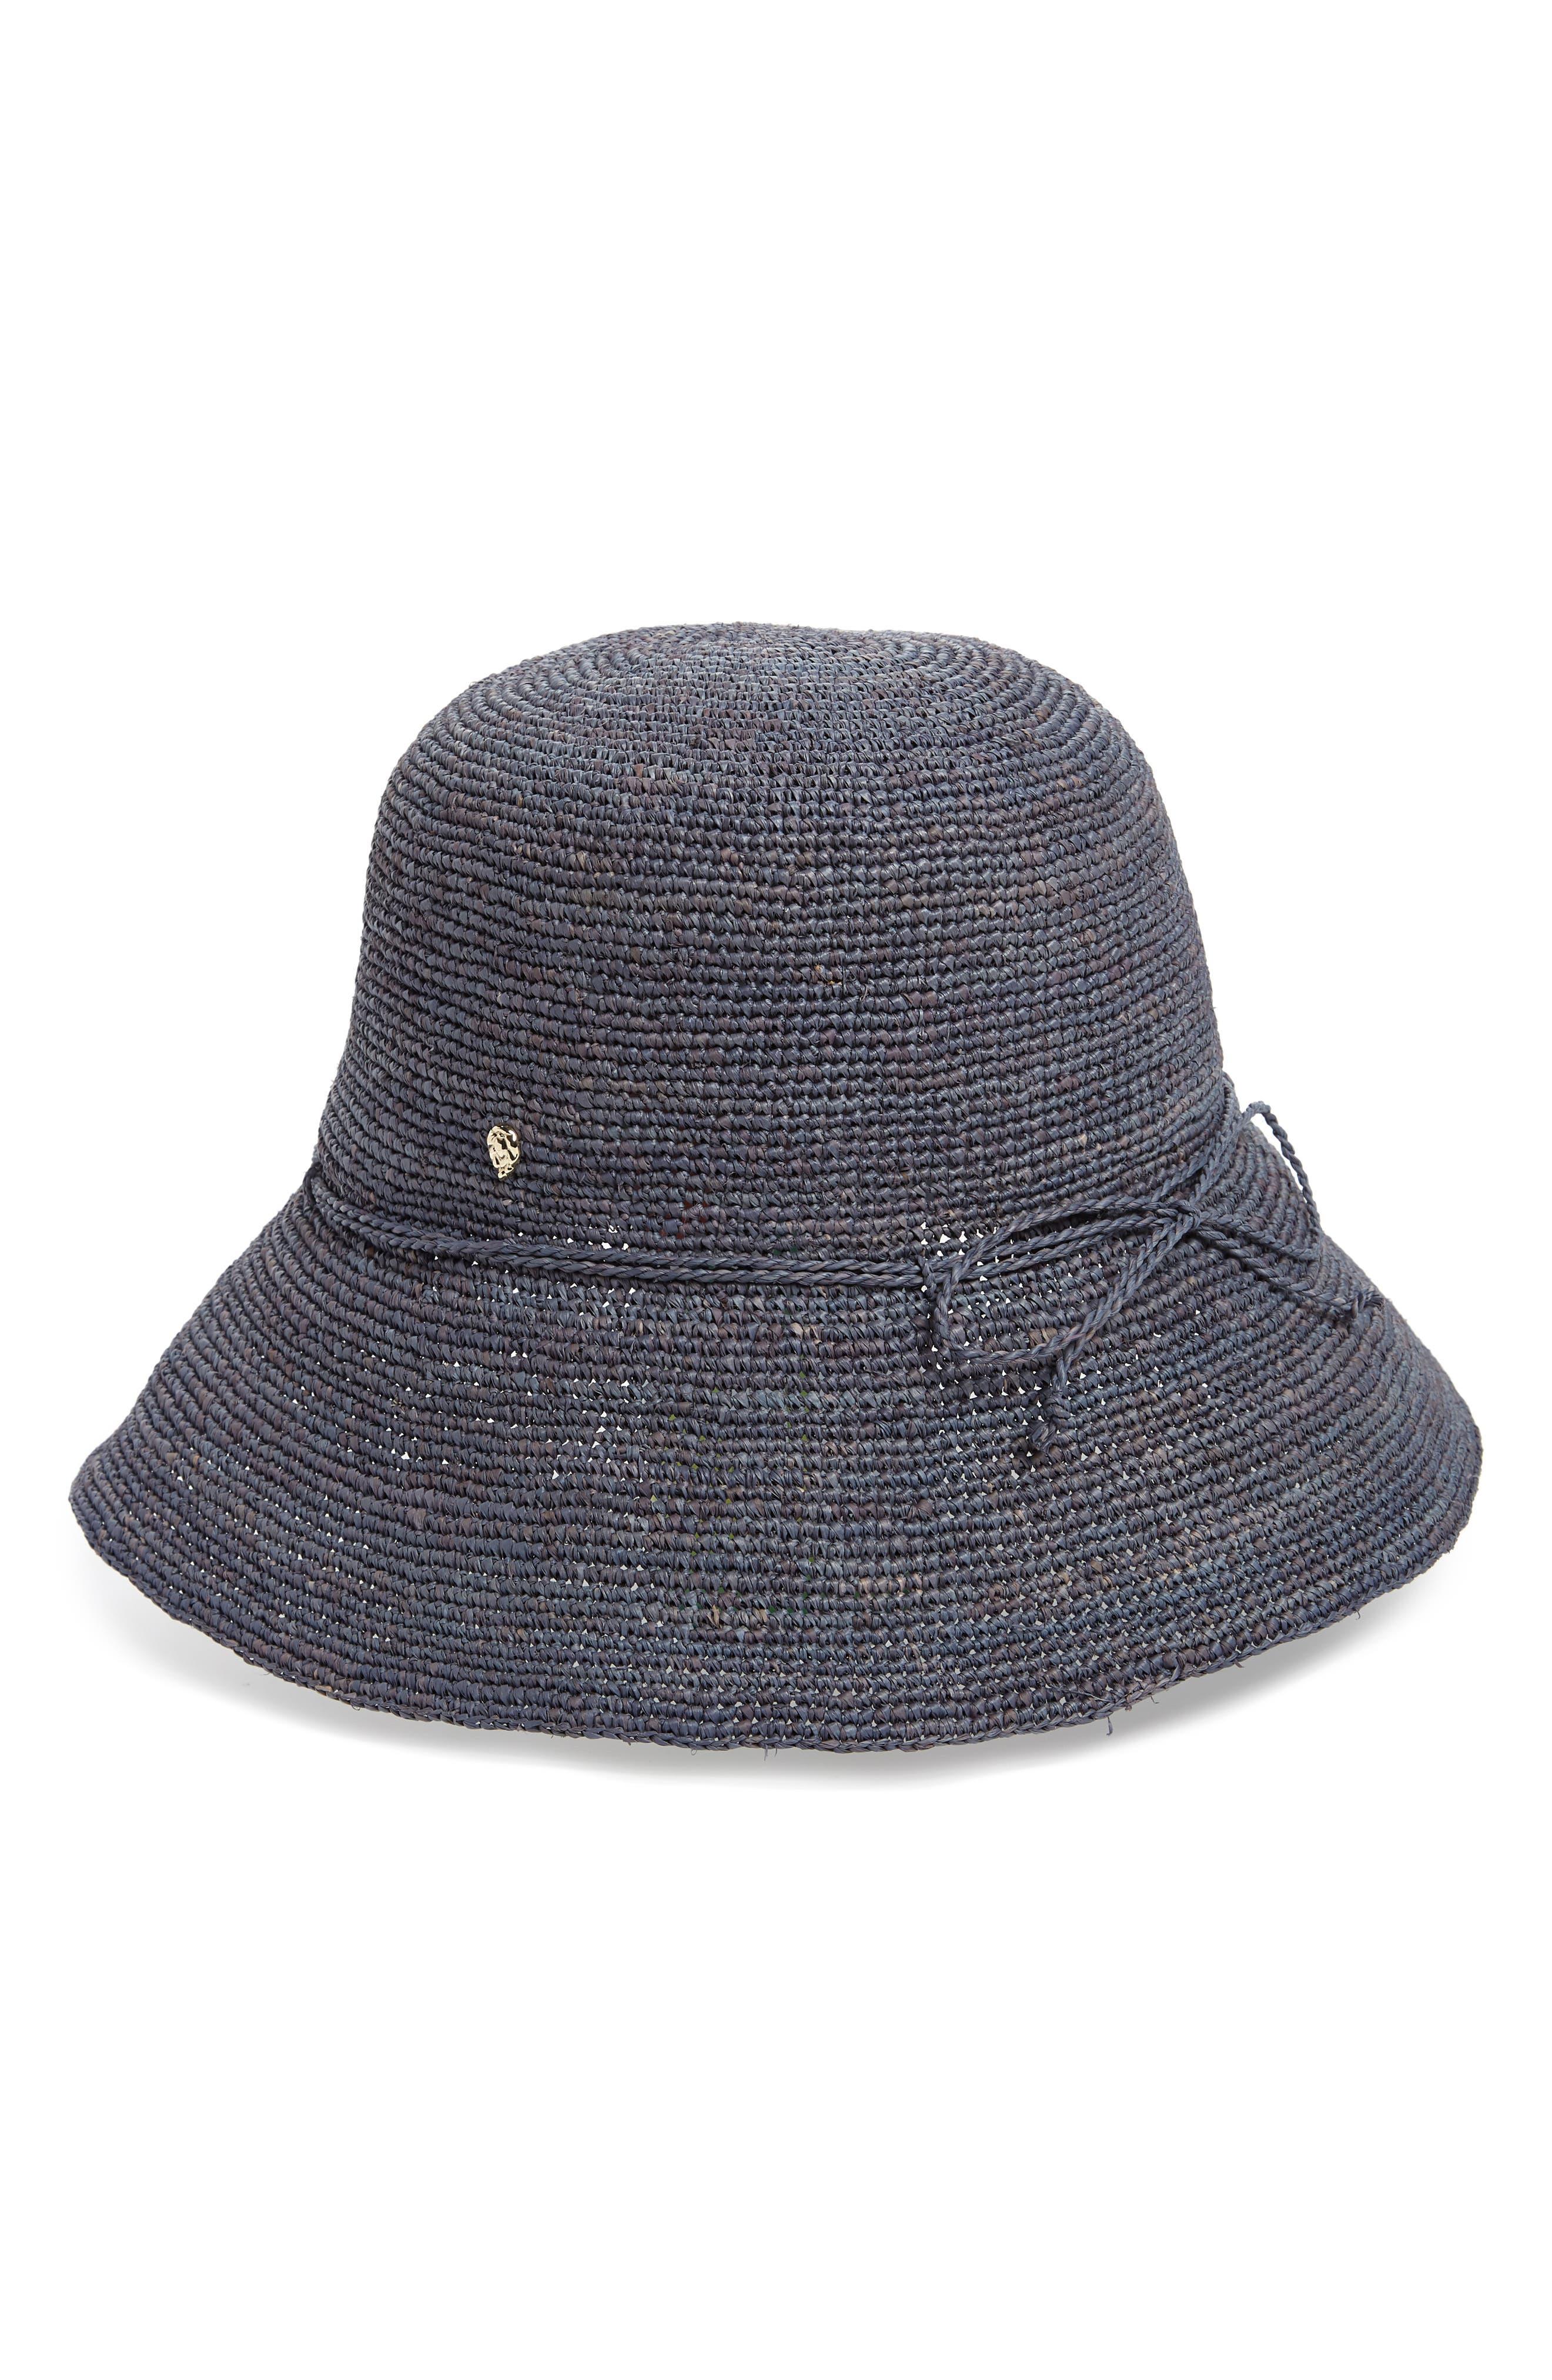 '9 Villa' Raffia Straw Hat,                             Main thumbnail 1, color,                             400